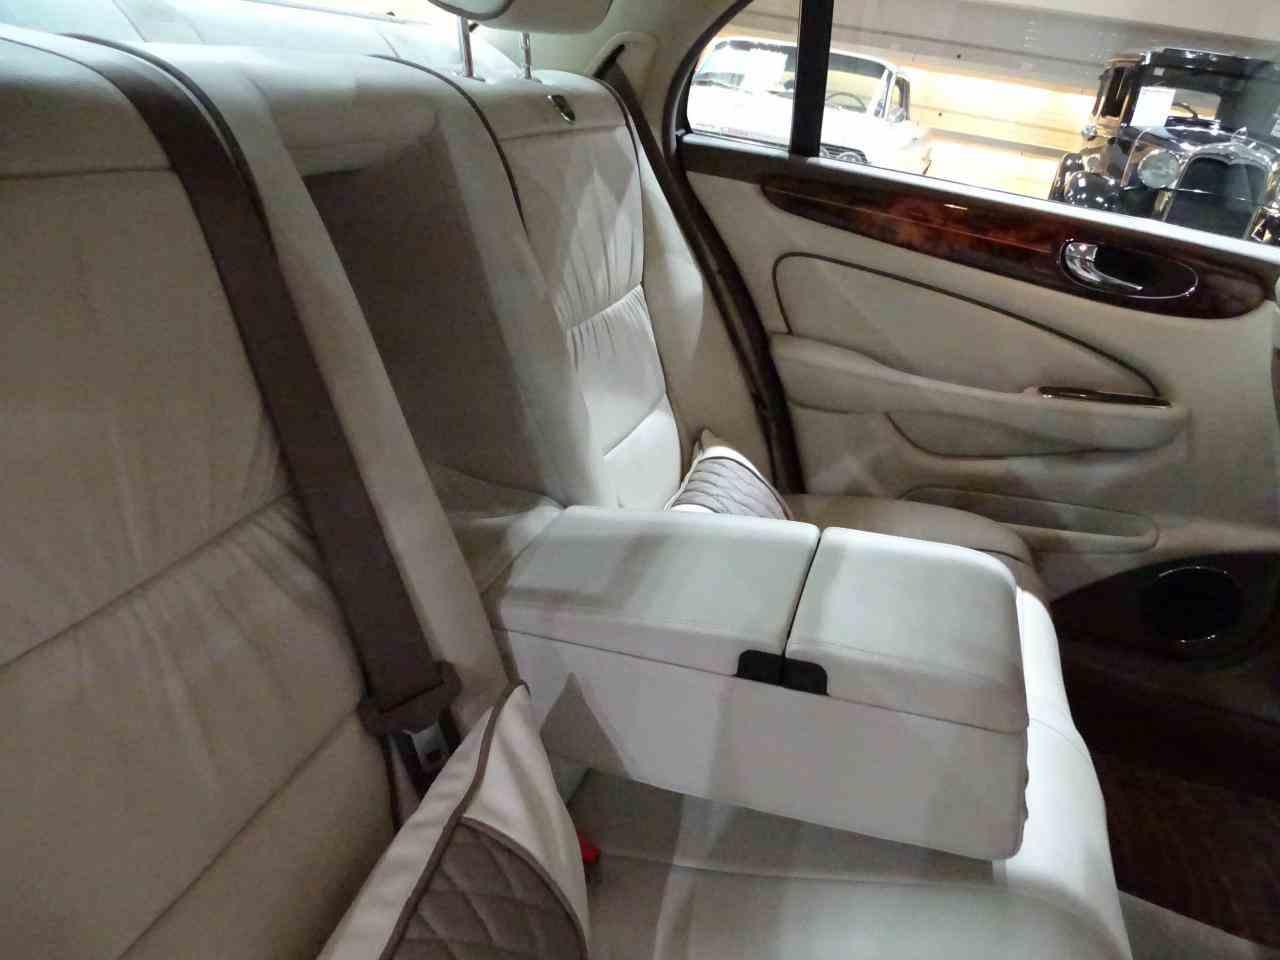 Large Picture of '06 Jaguar XJ8 located in O'Fallon Illinois - $14,995.00 - MFNT